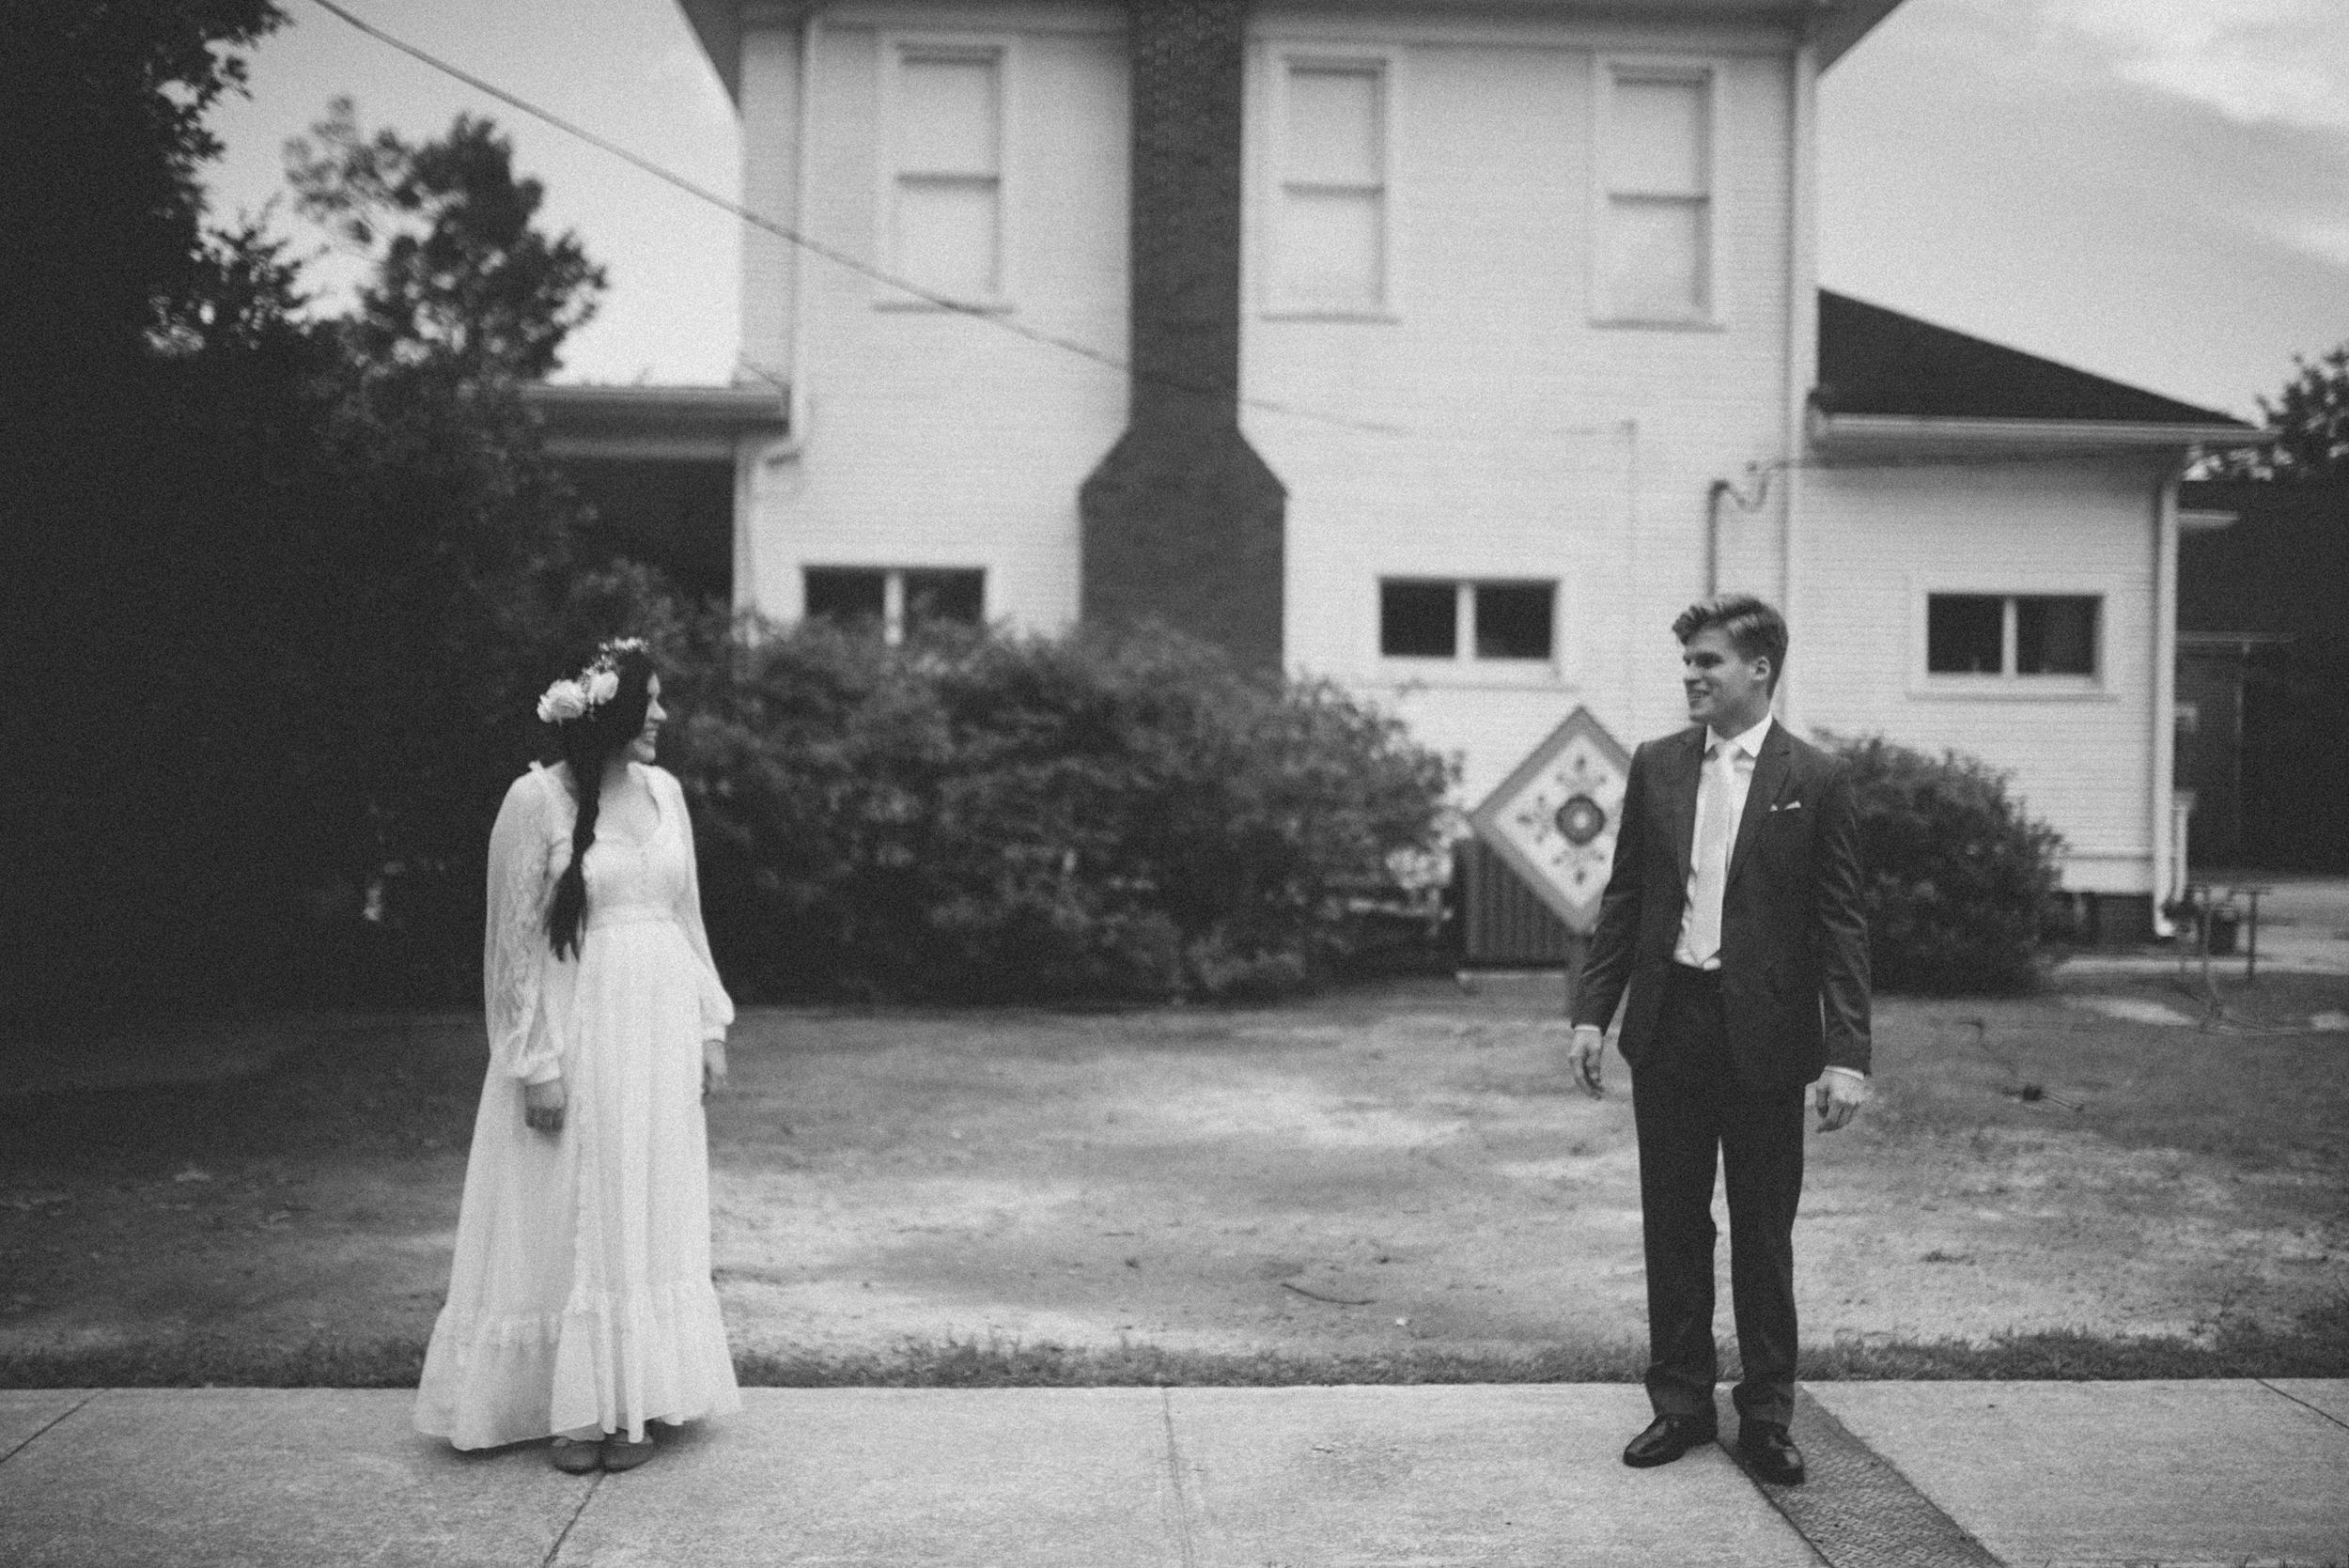 ofRen_weddingphotographer-95.jpg